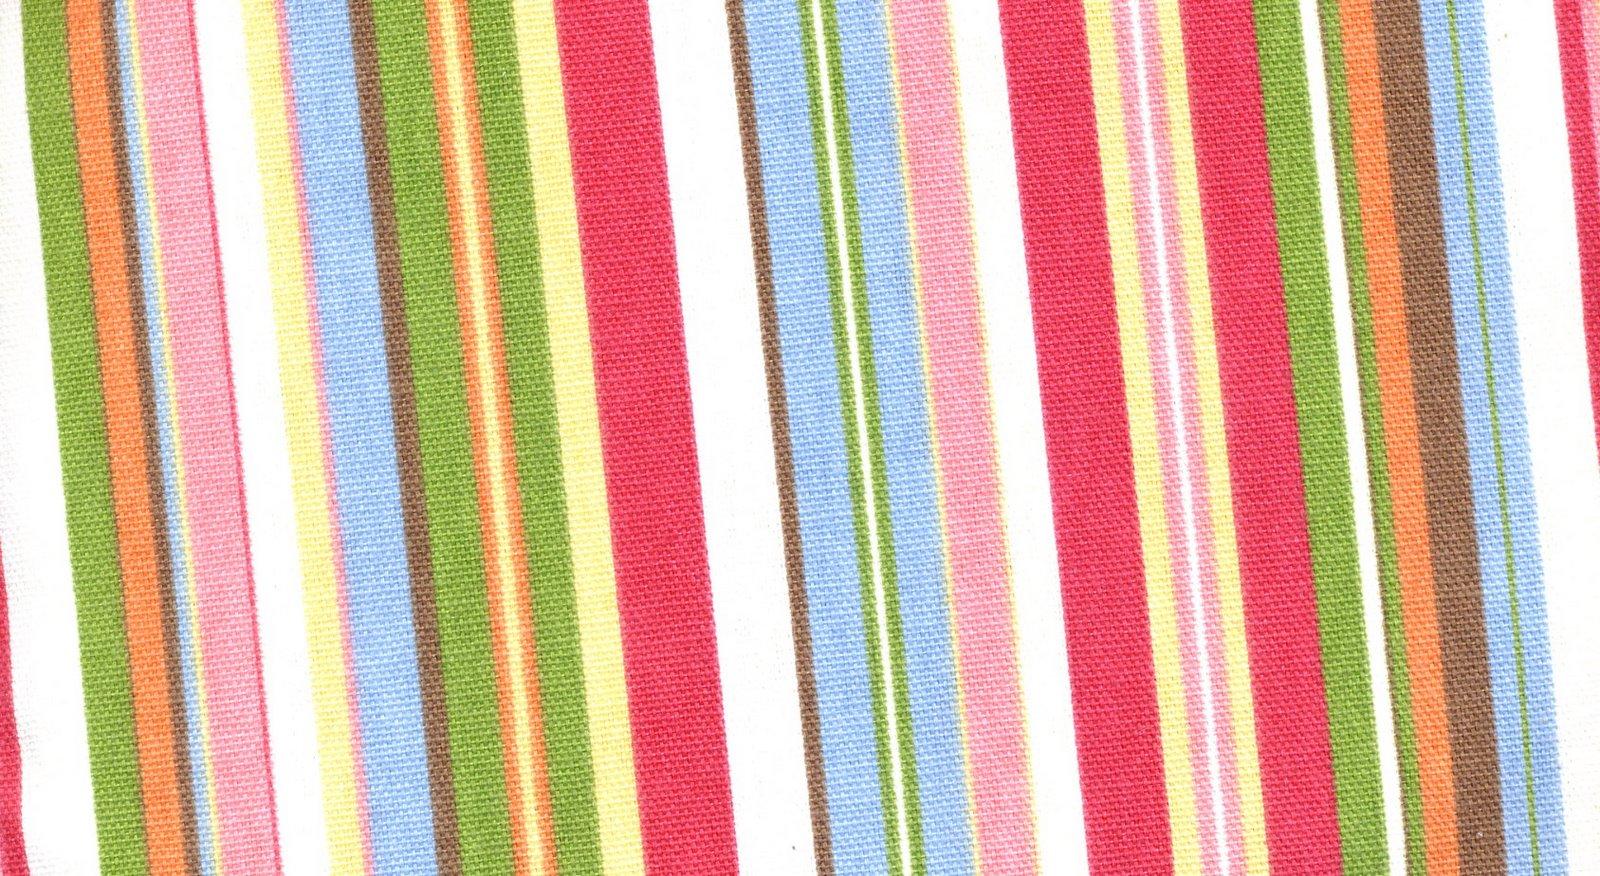 [fabric.jpg]